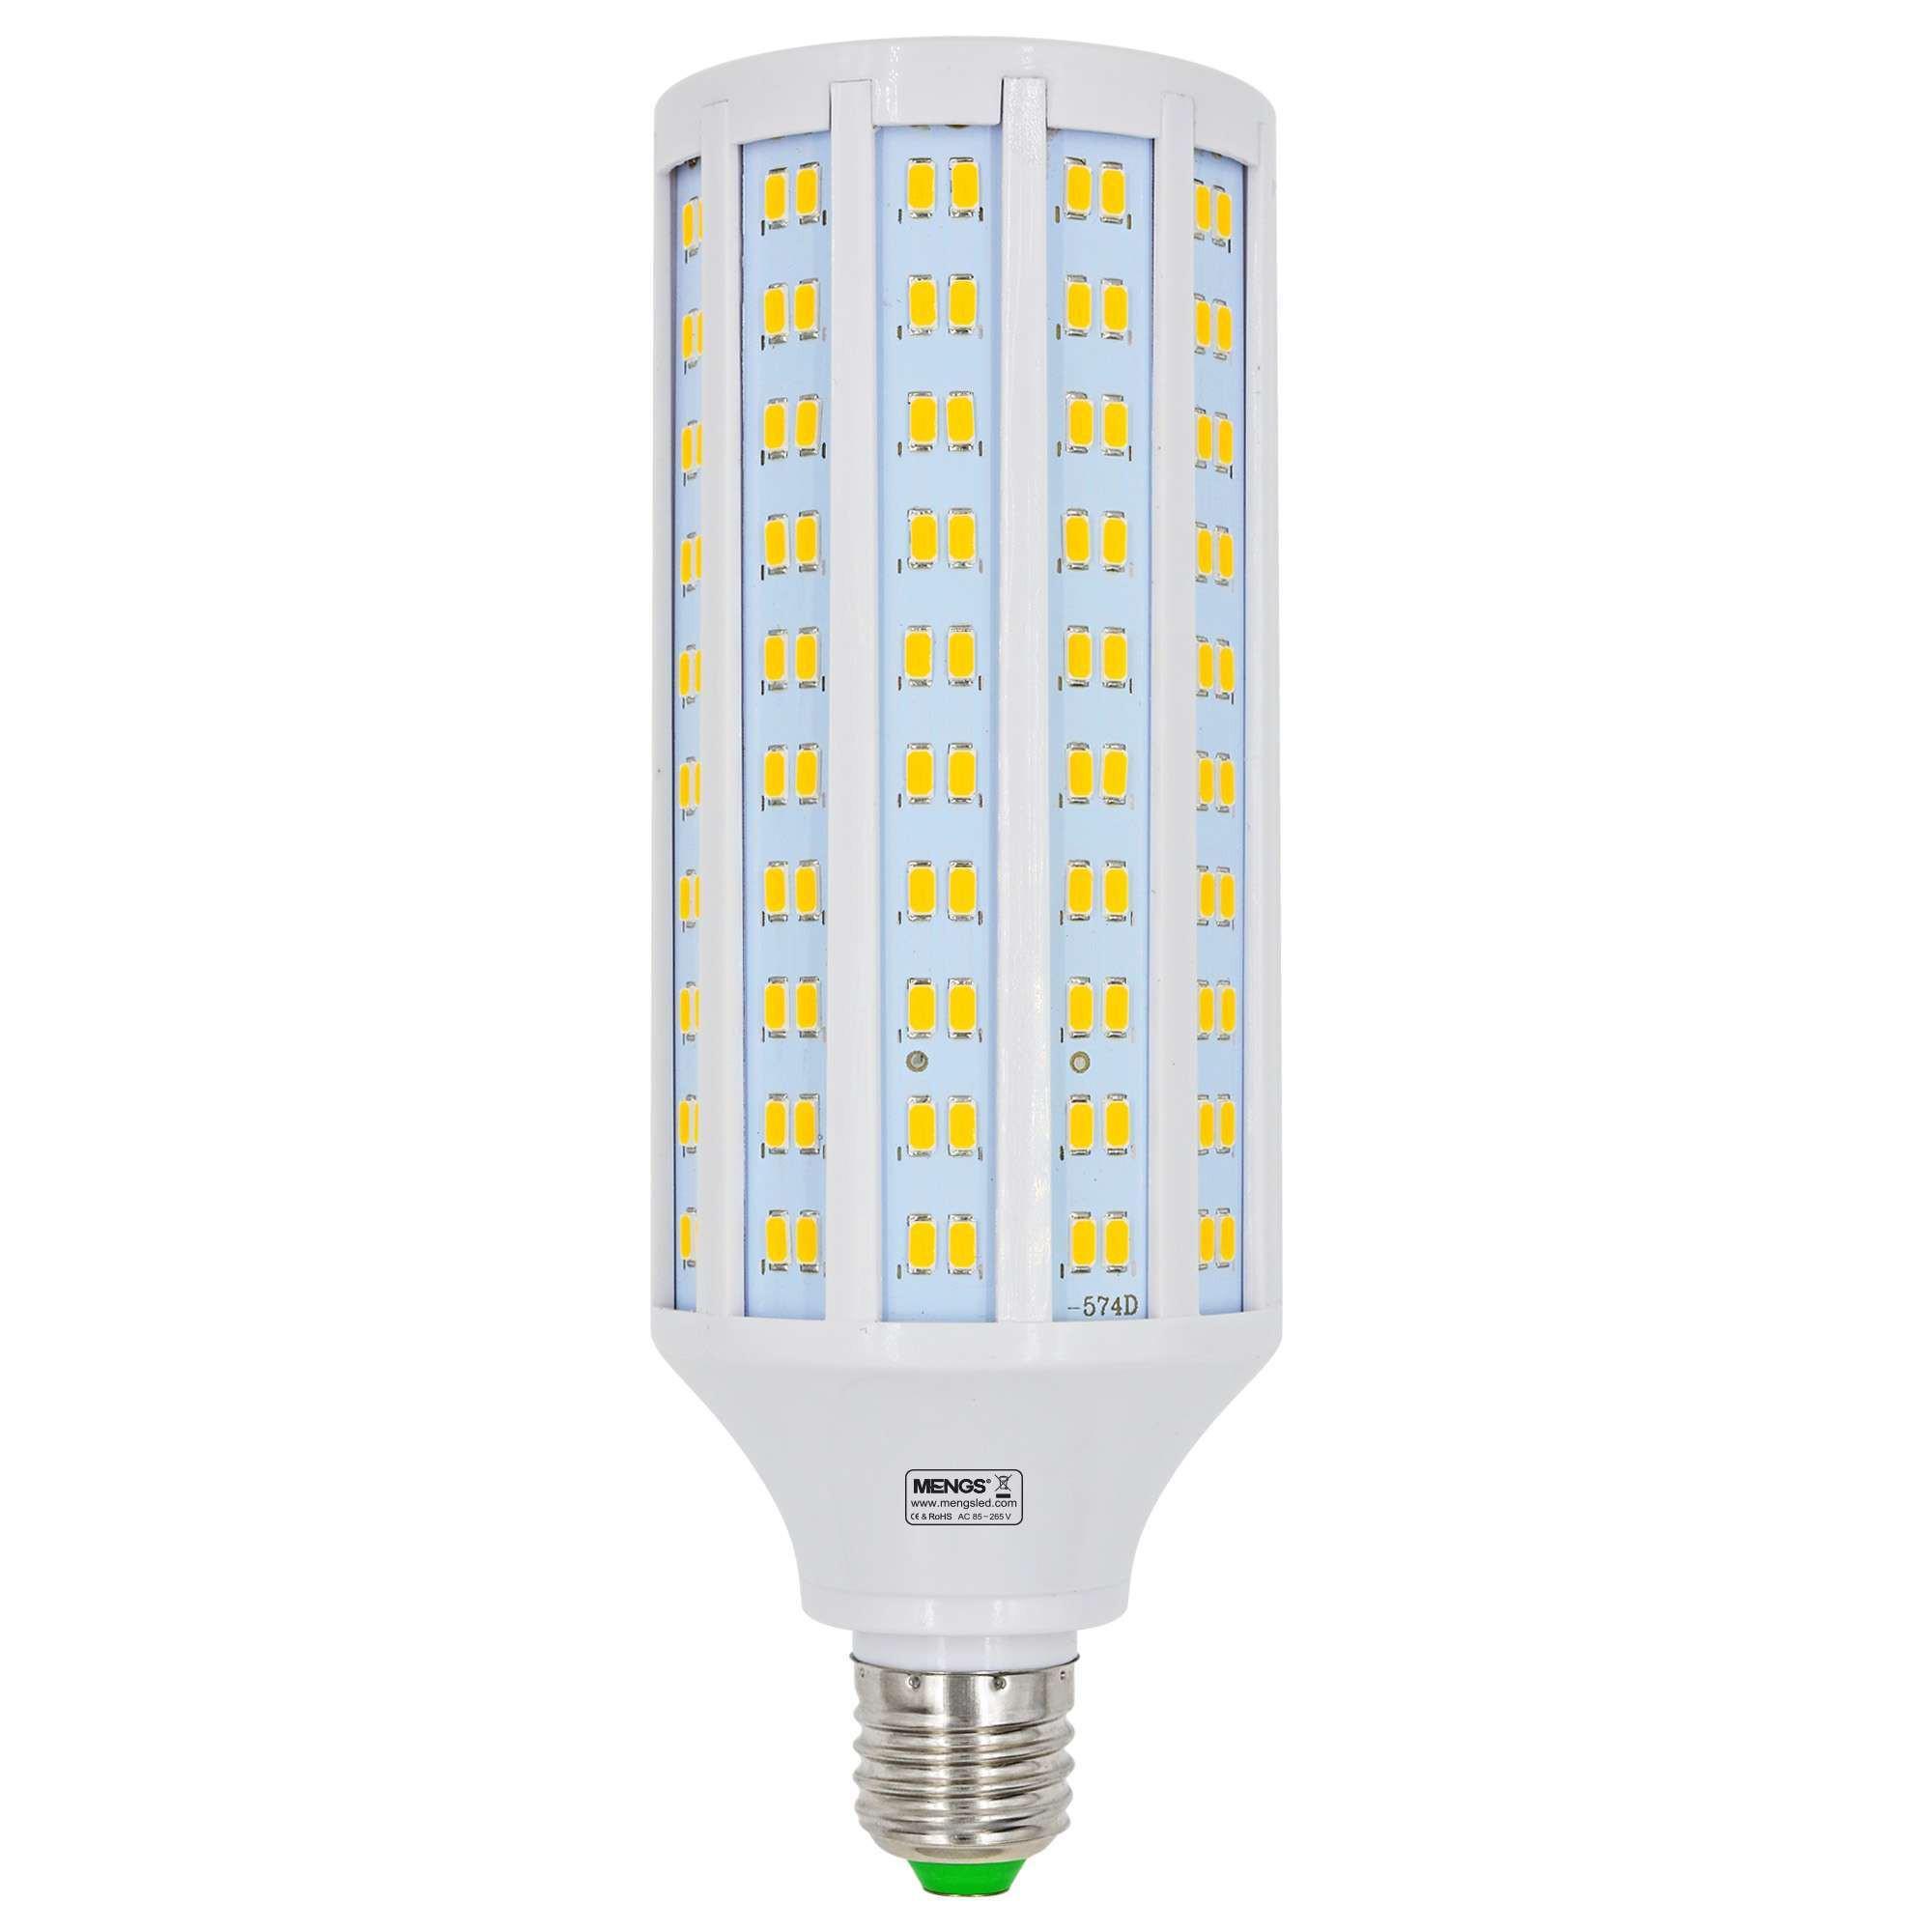 e27 40w led corn light 280x 5730 smd led bulb lamp ac 85 265v in warm white energy saving light. Black Bedroom Furniture Sets. Home Design Ideas